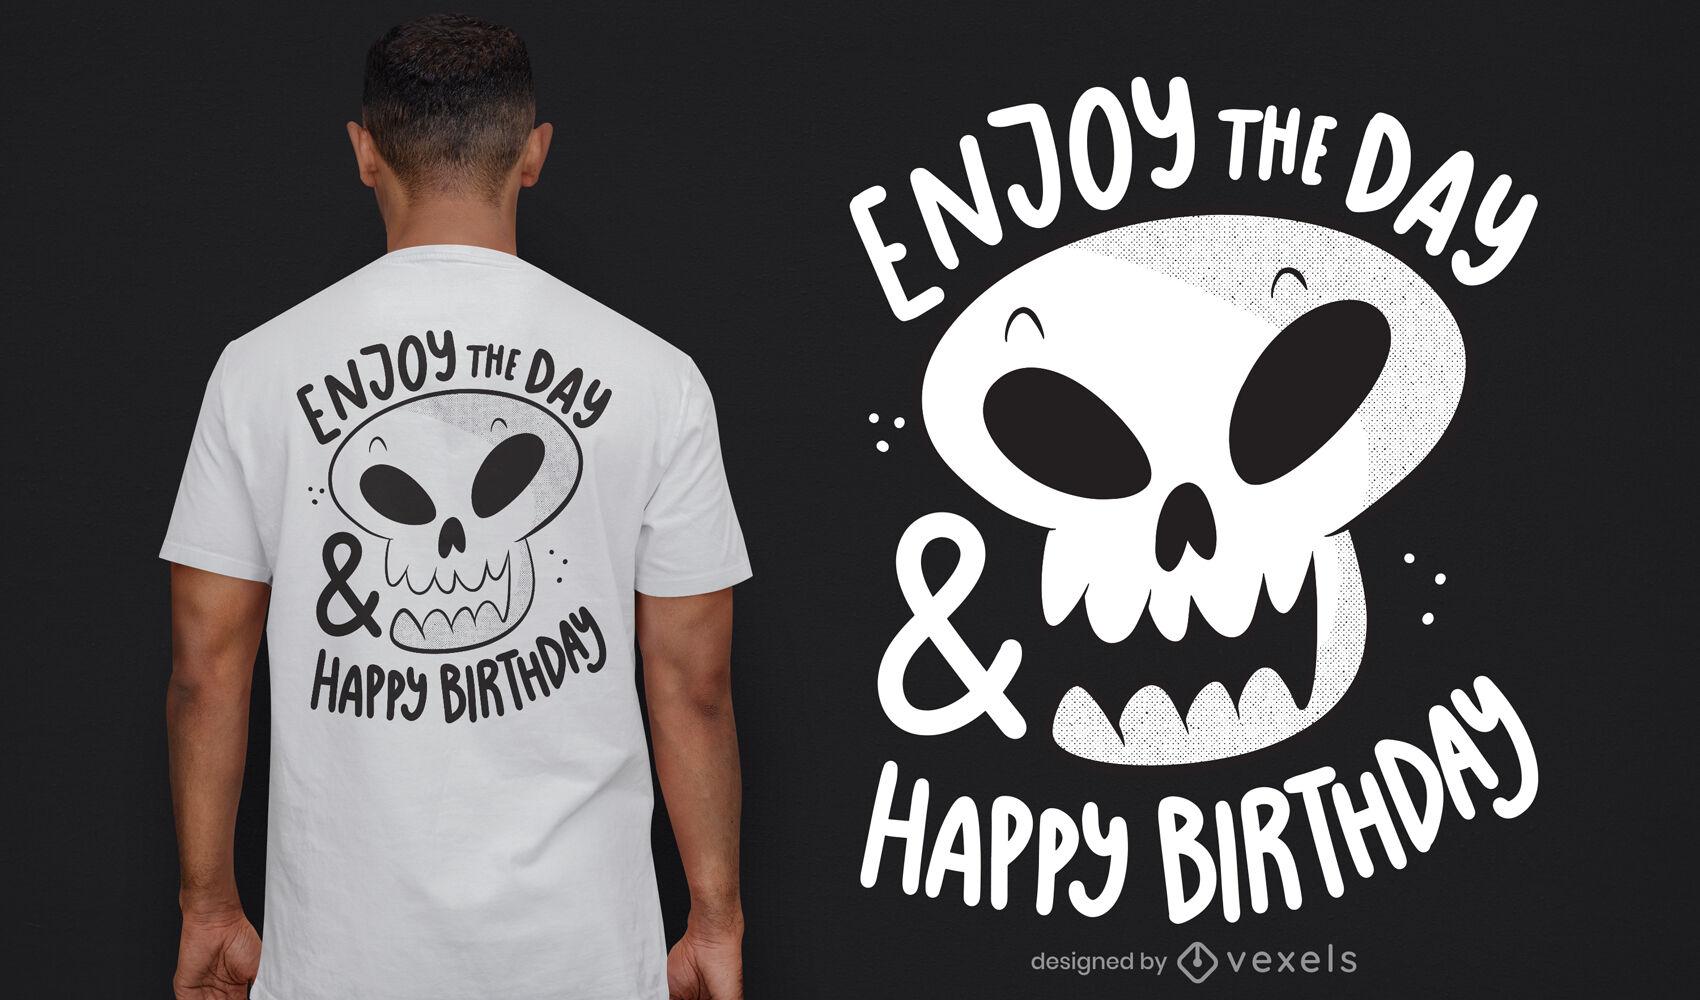 Happy birthday skull t-shirt design